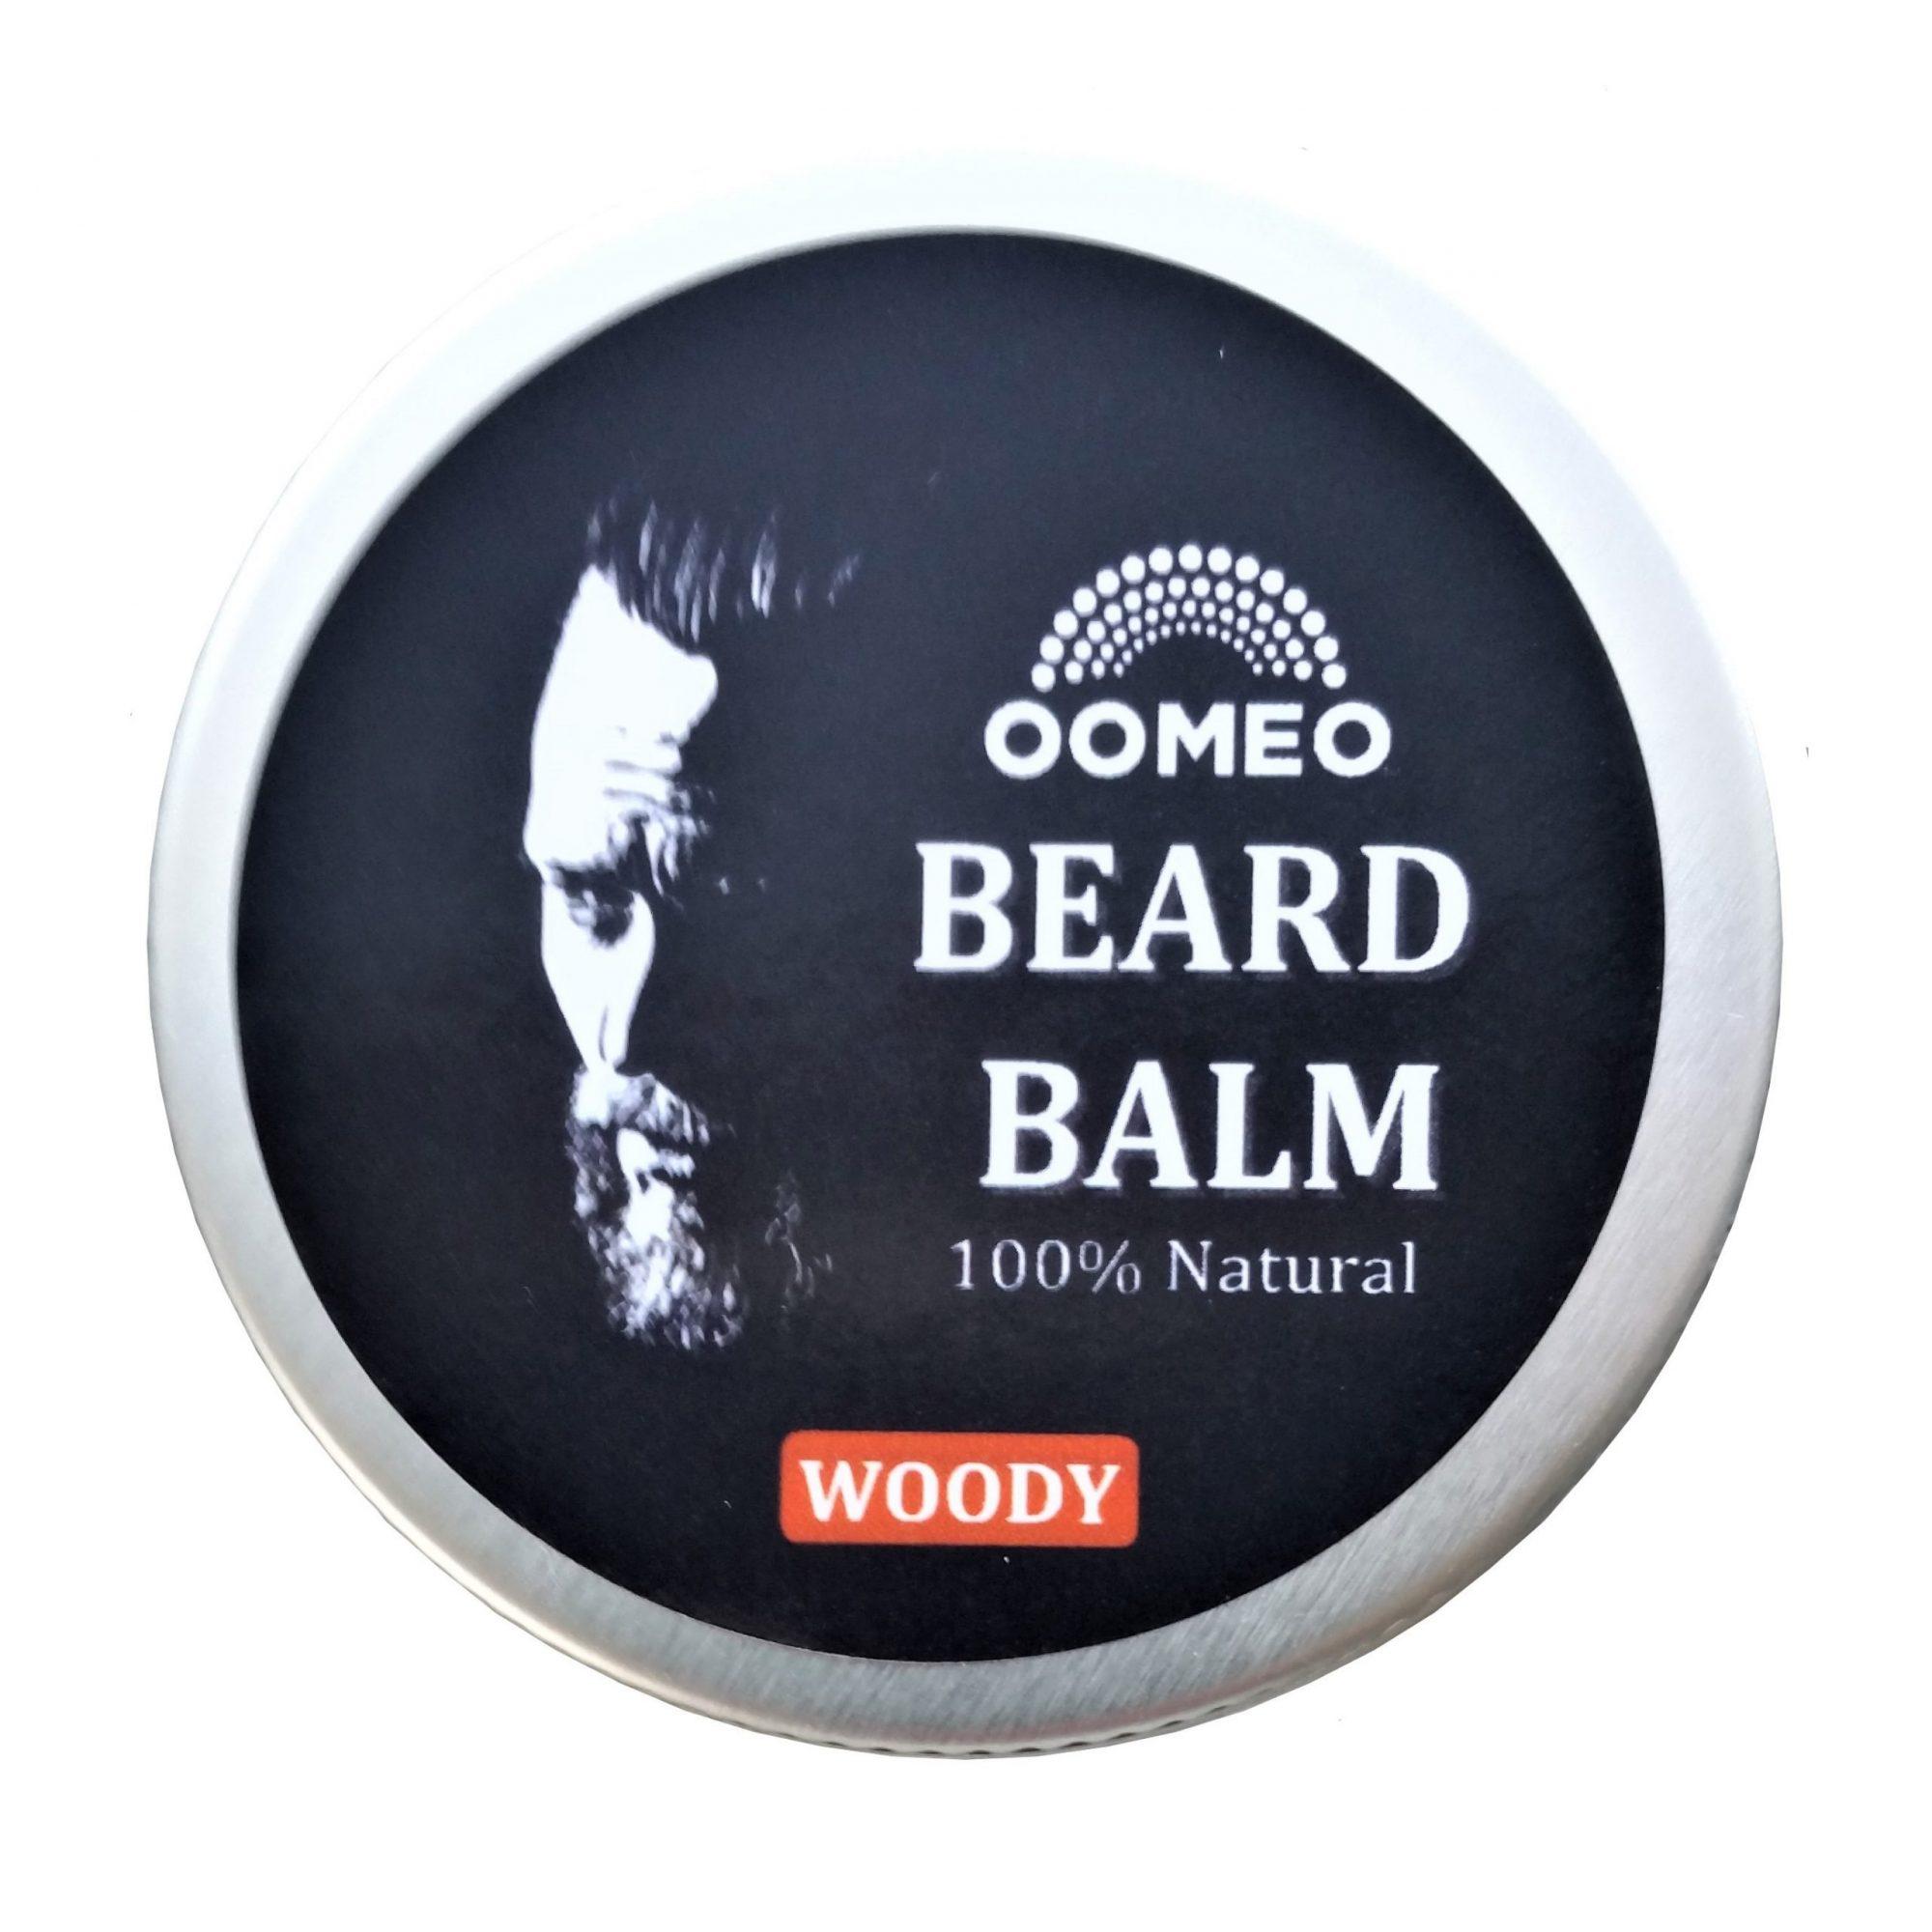 25g Woody Beard Balm